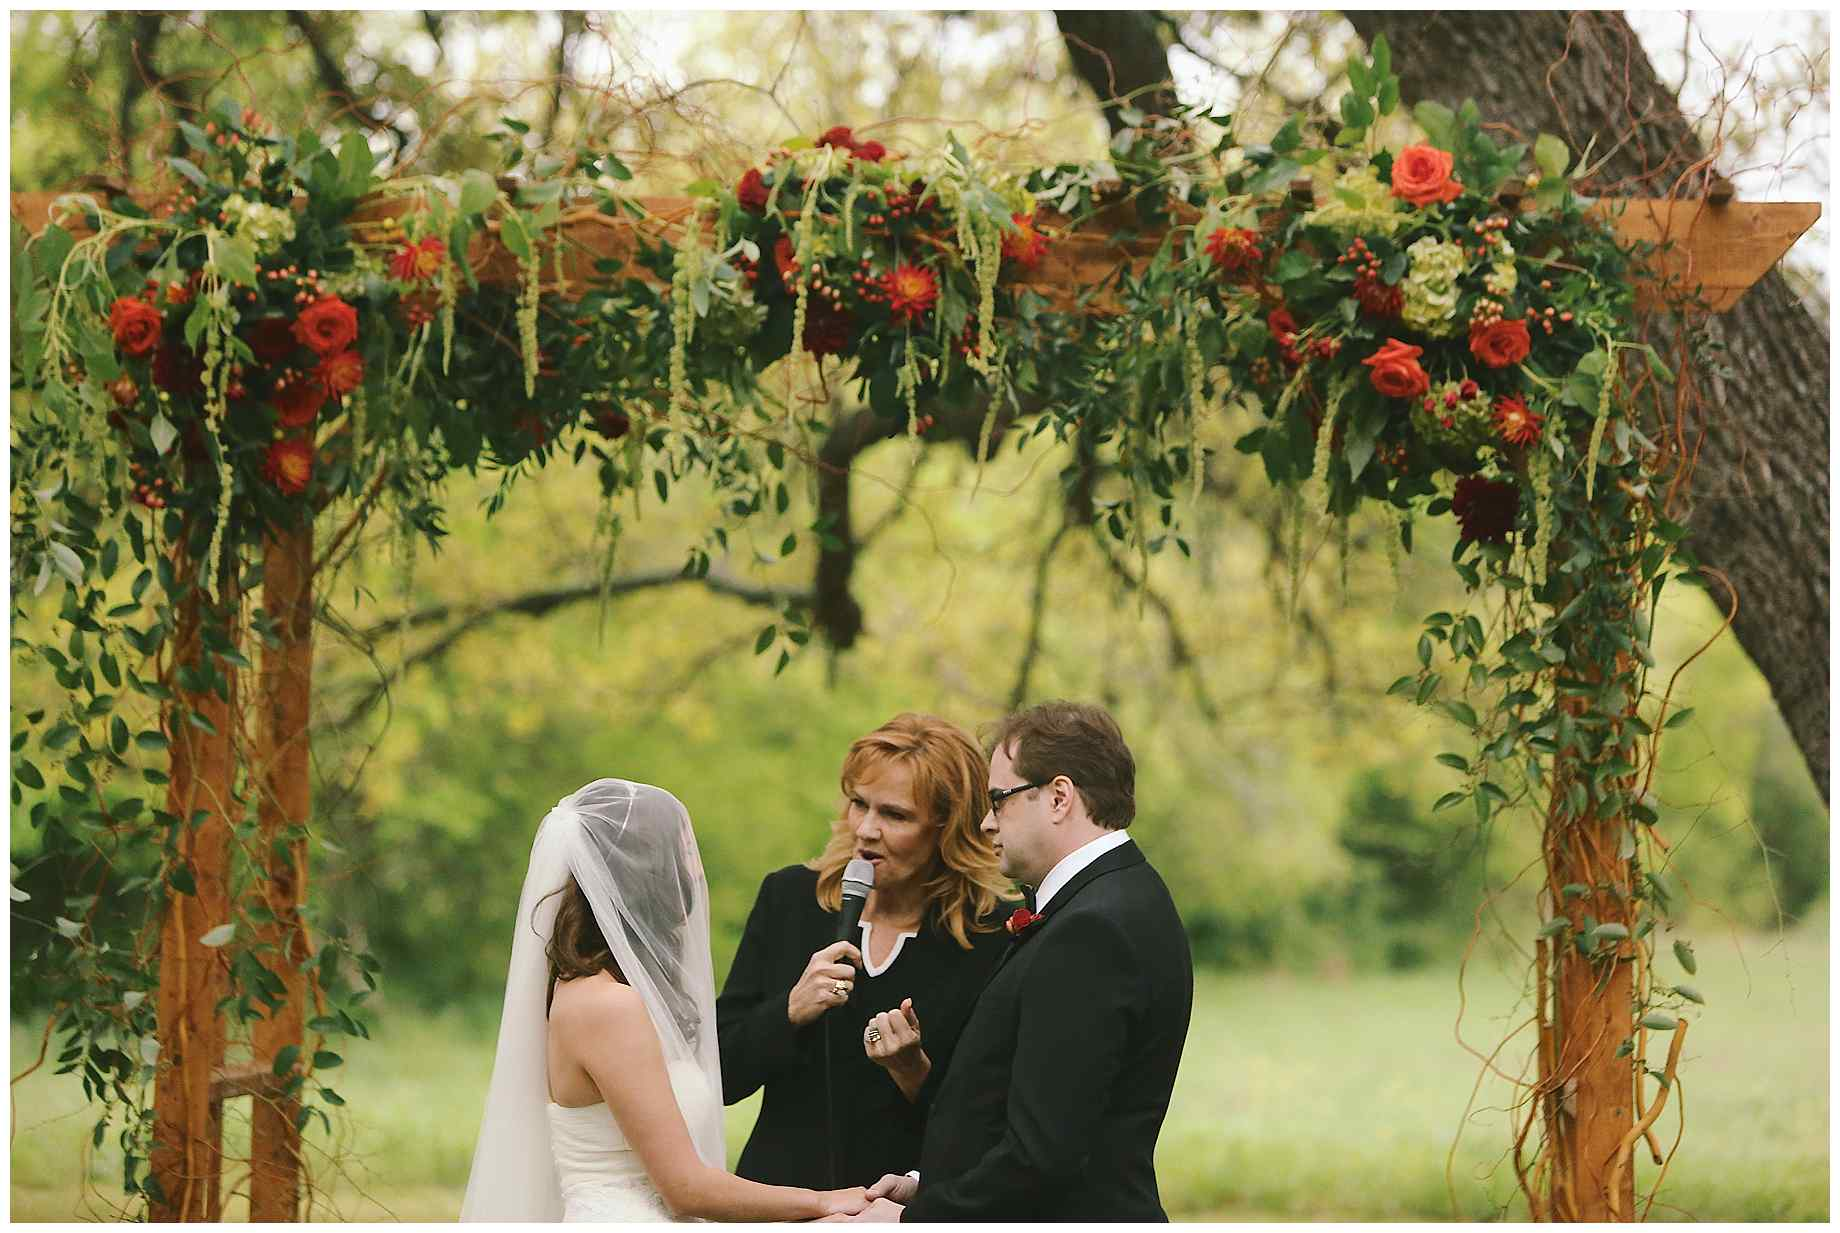 vineyard-at-the-chappel-lodge-wedding-photographer-09